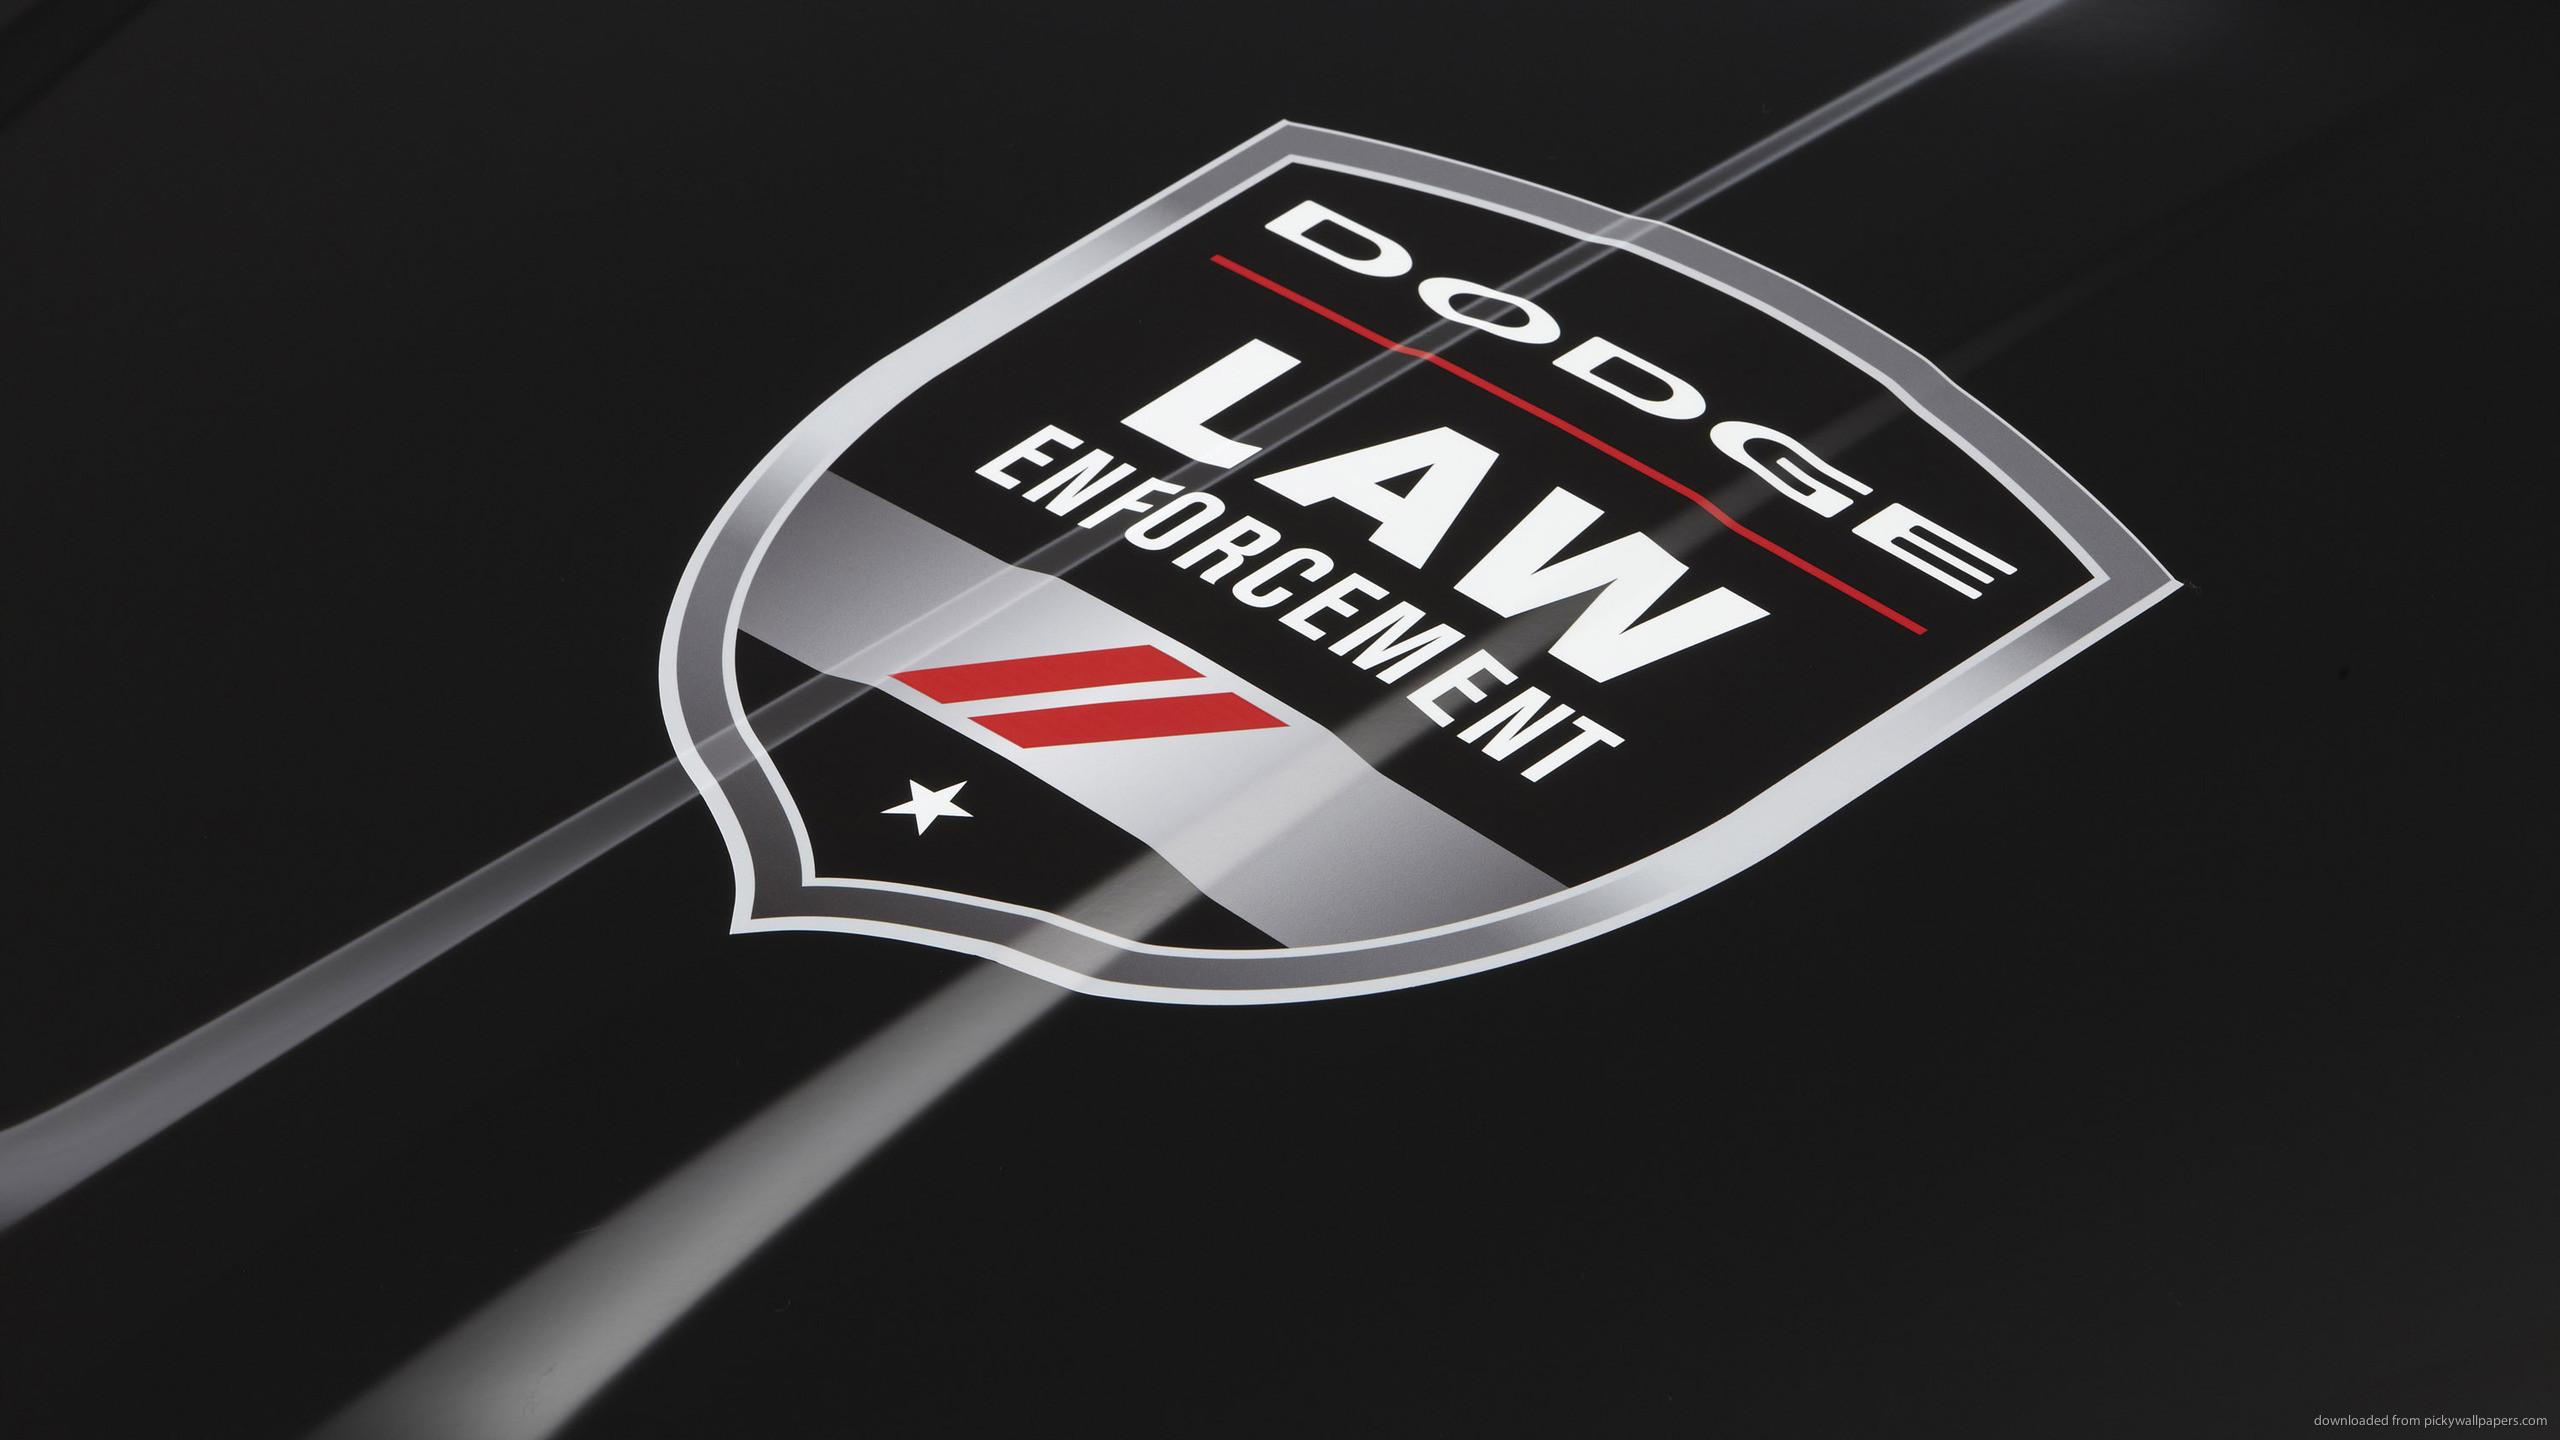 Dodge Ram Logo Wallpaper Hd 57 Images